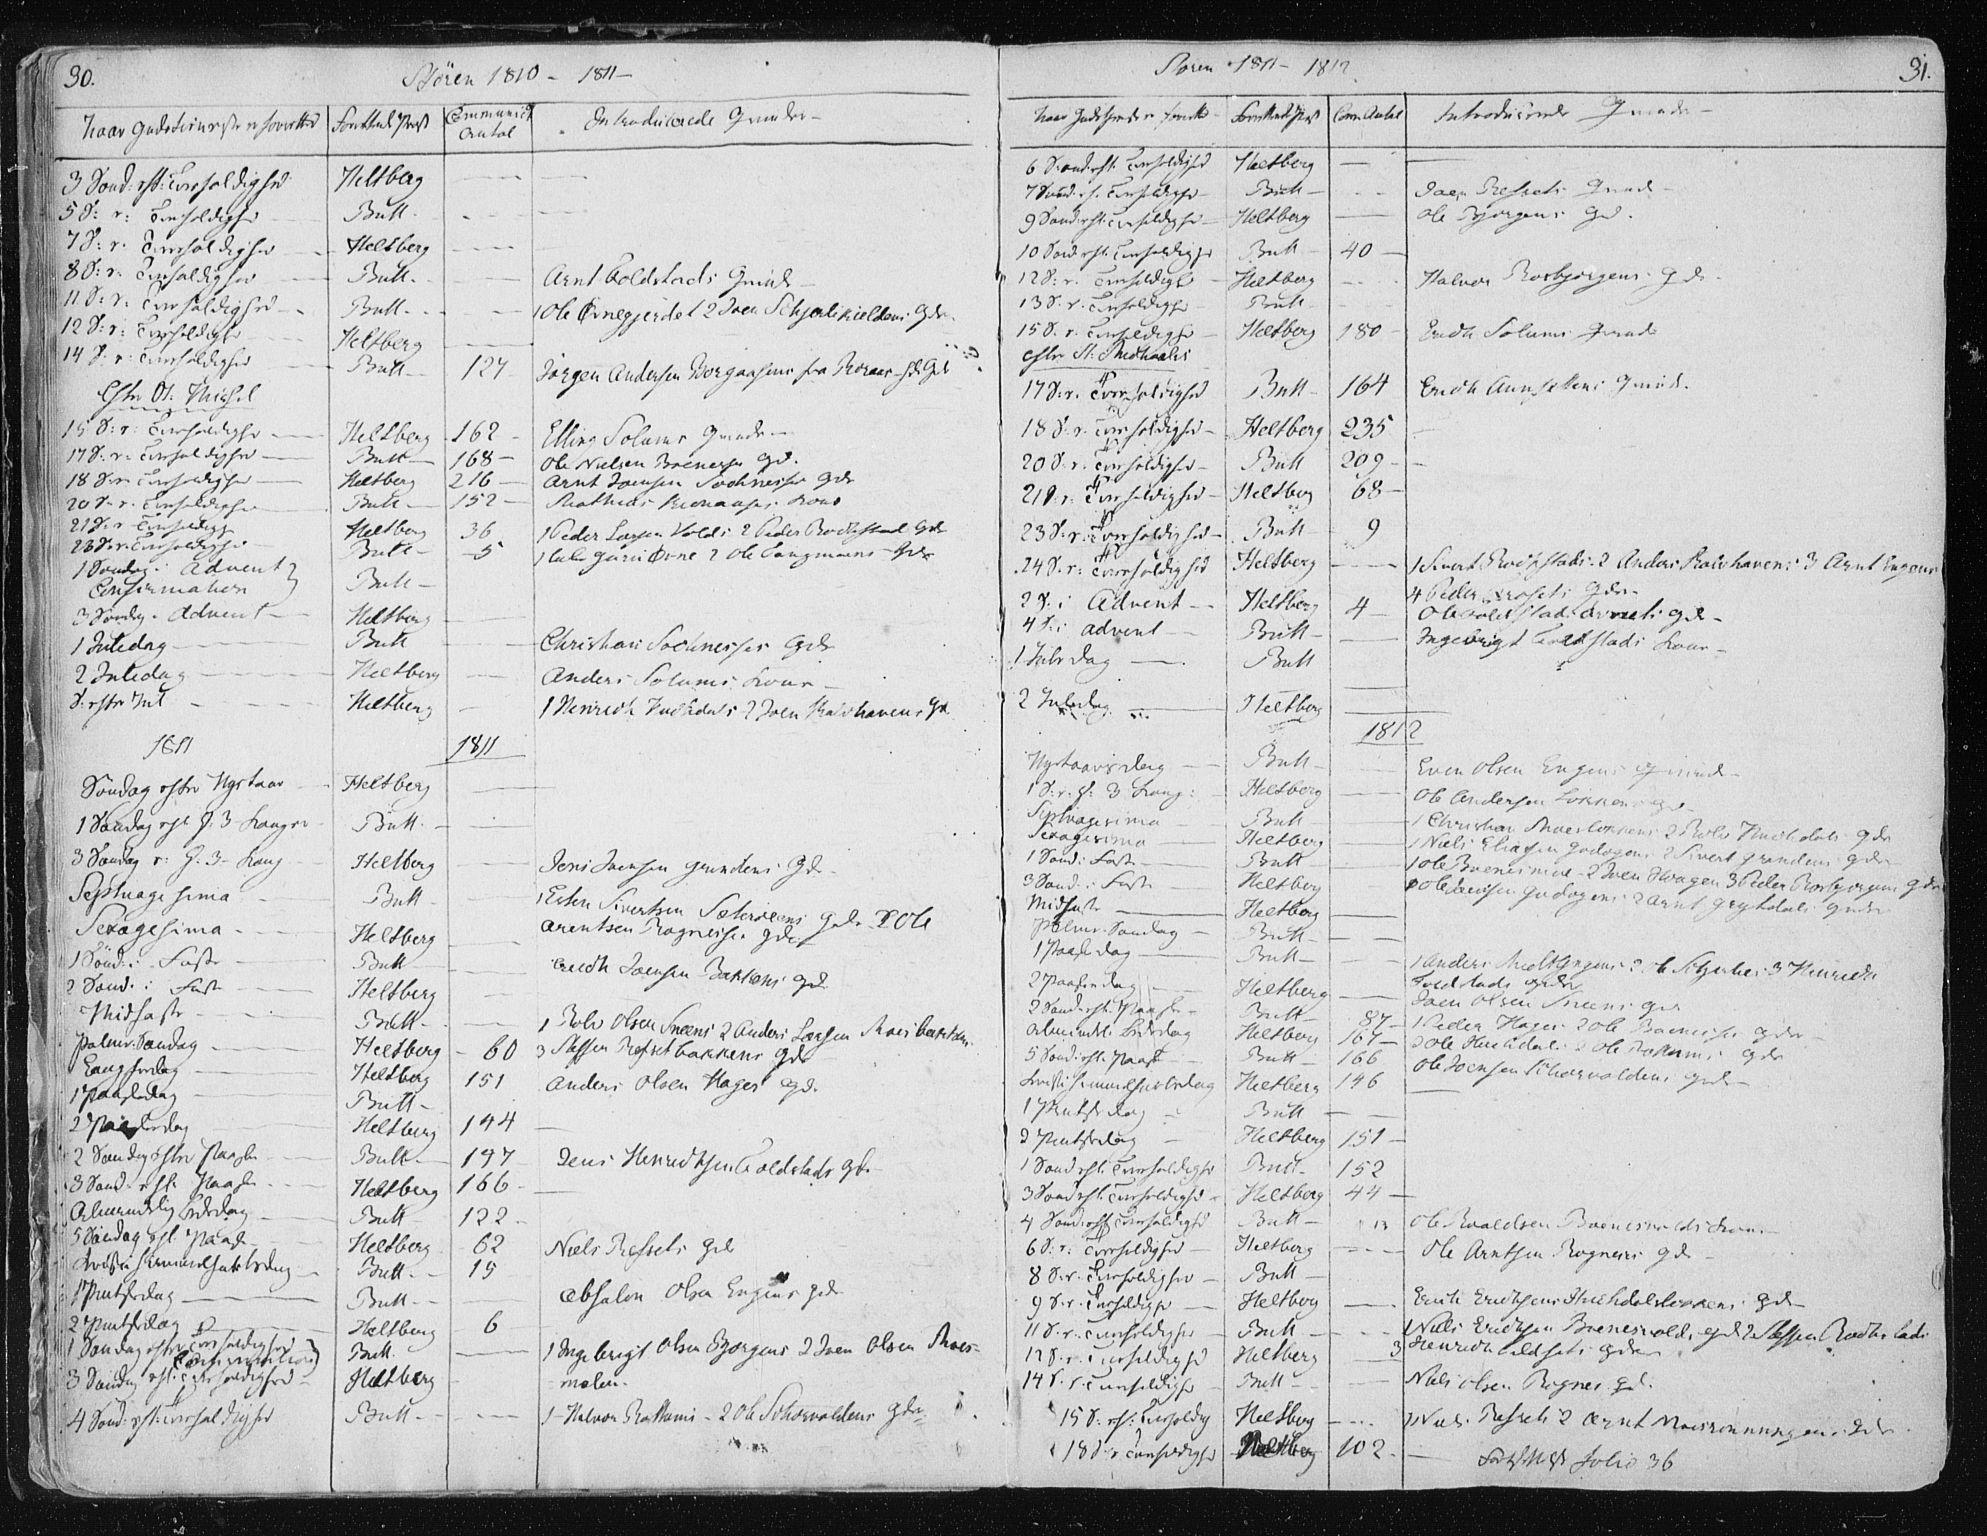 SAT, Ministerialprotokoller, klokkerbøker og fødselsregistre - Sør-Trøndelag, 687/L0992: Parish register (official) no. 687A03 /1, 1788-1815, p. 30-31